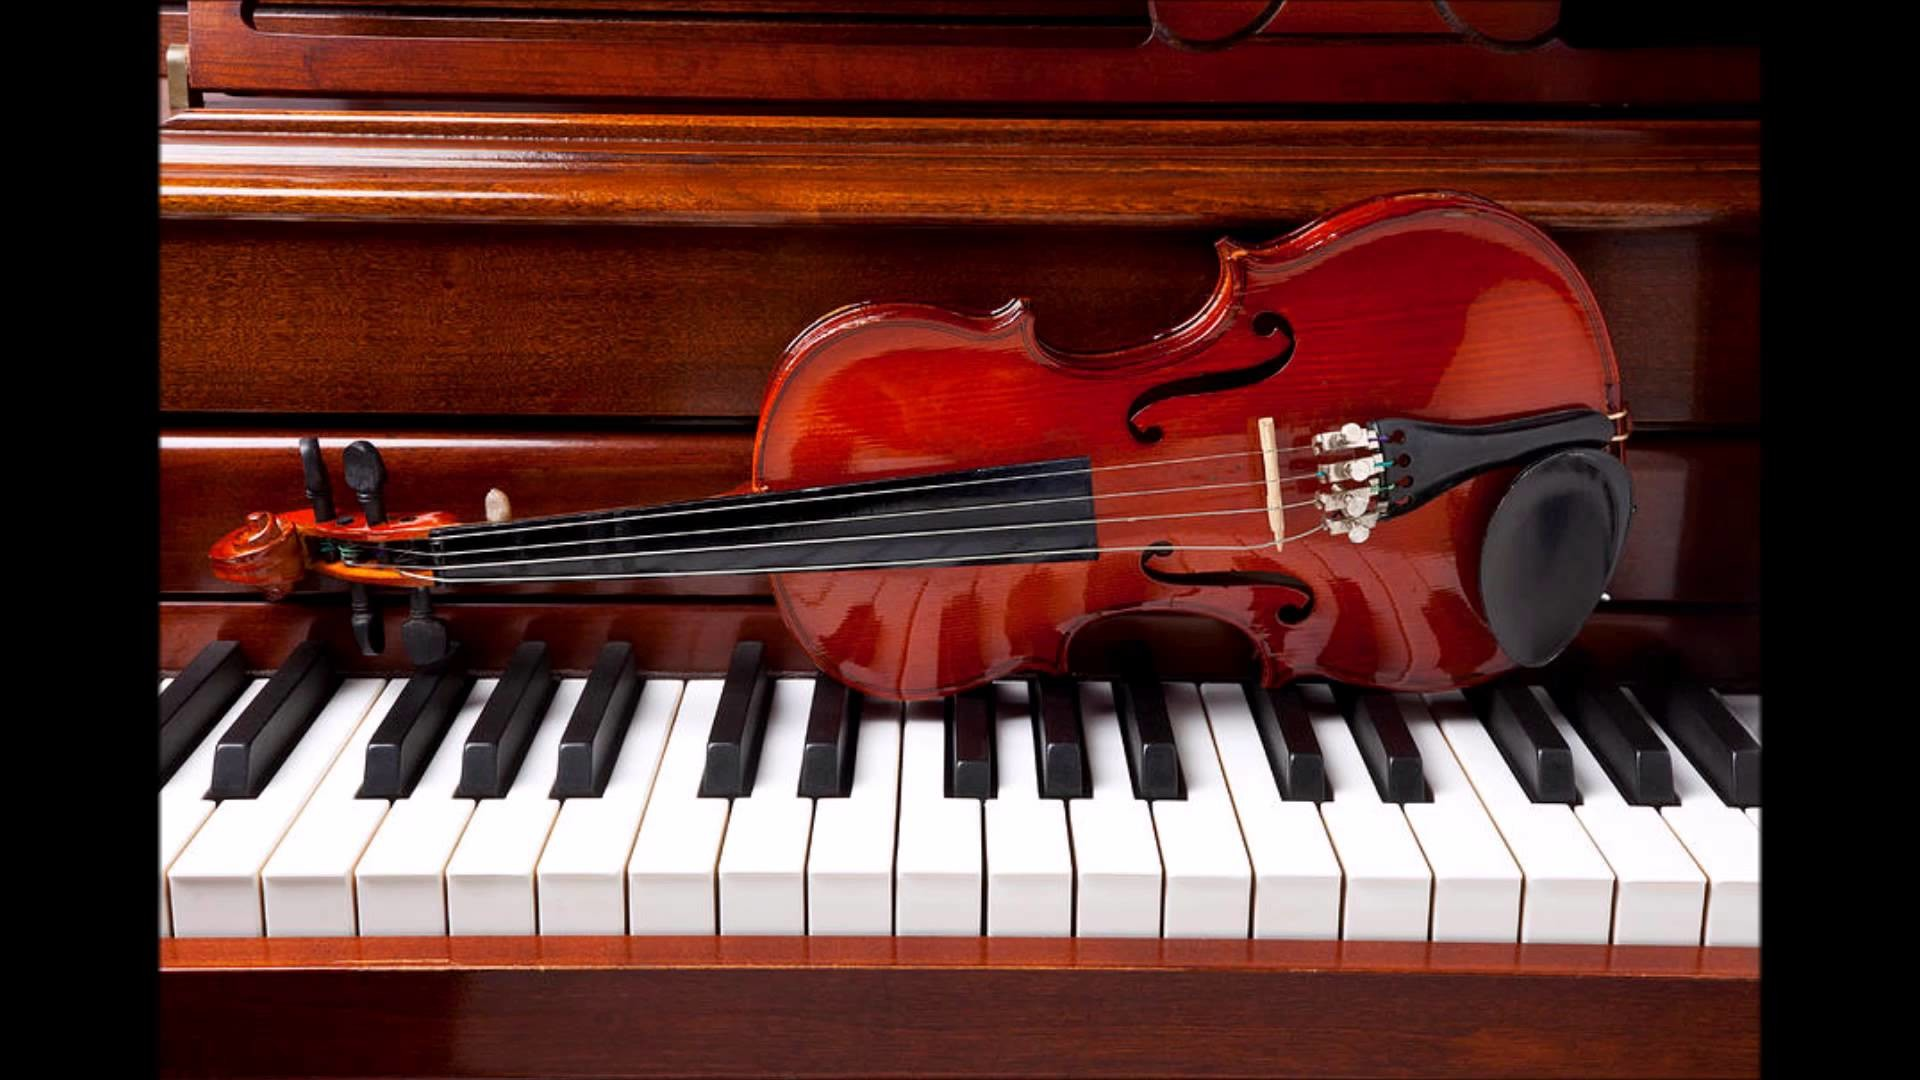 Download Violin Piano Wallpaper Widescreen #10h px 162.38 KB .